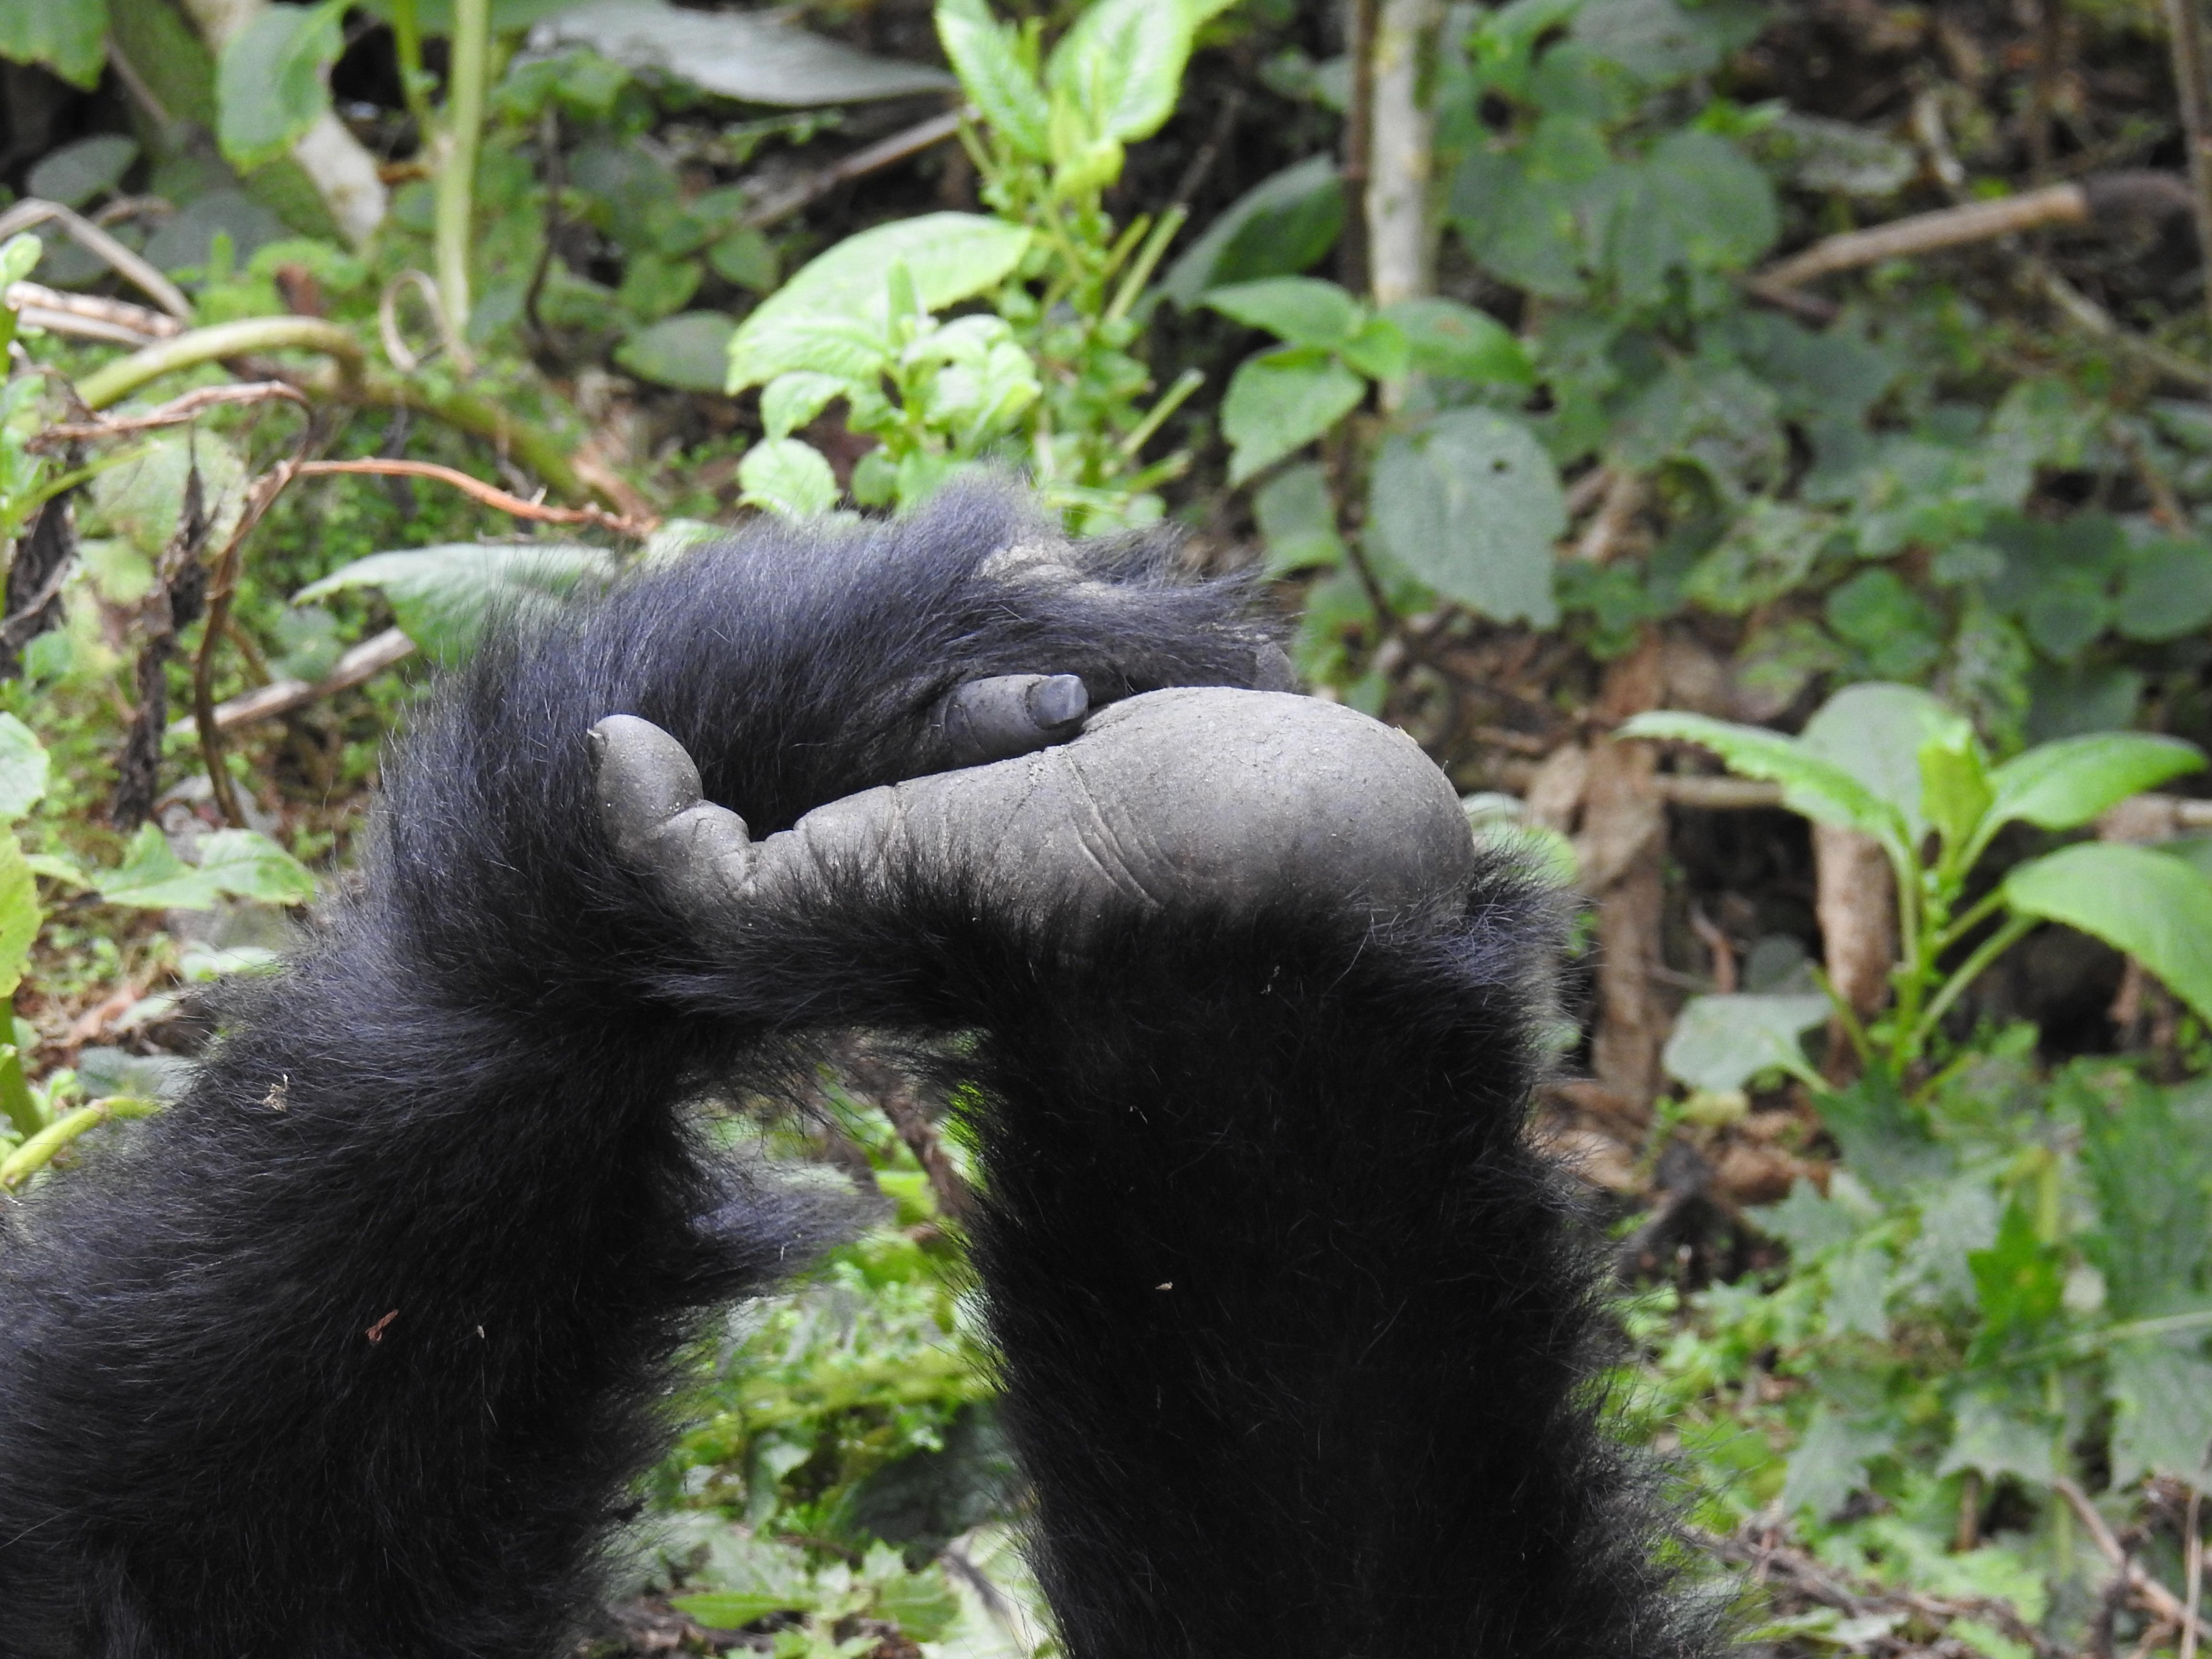 Gorilla_hands.jpg